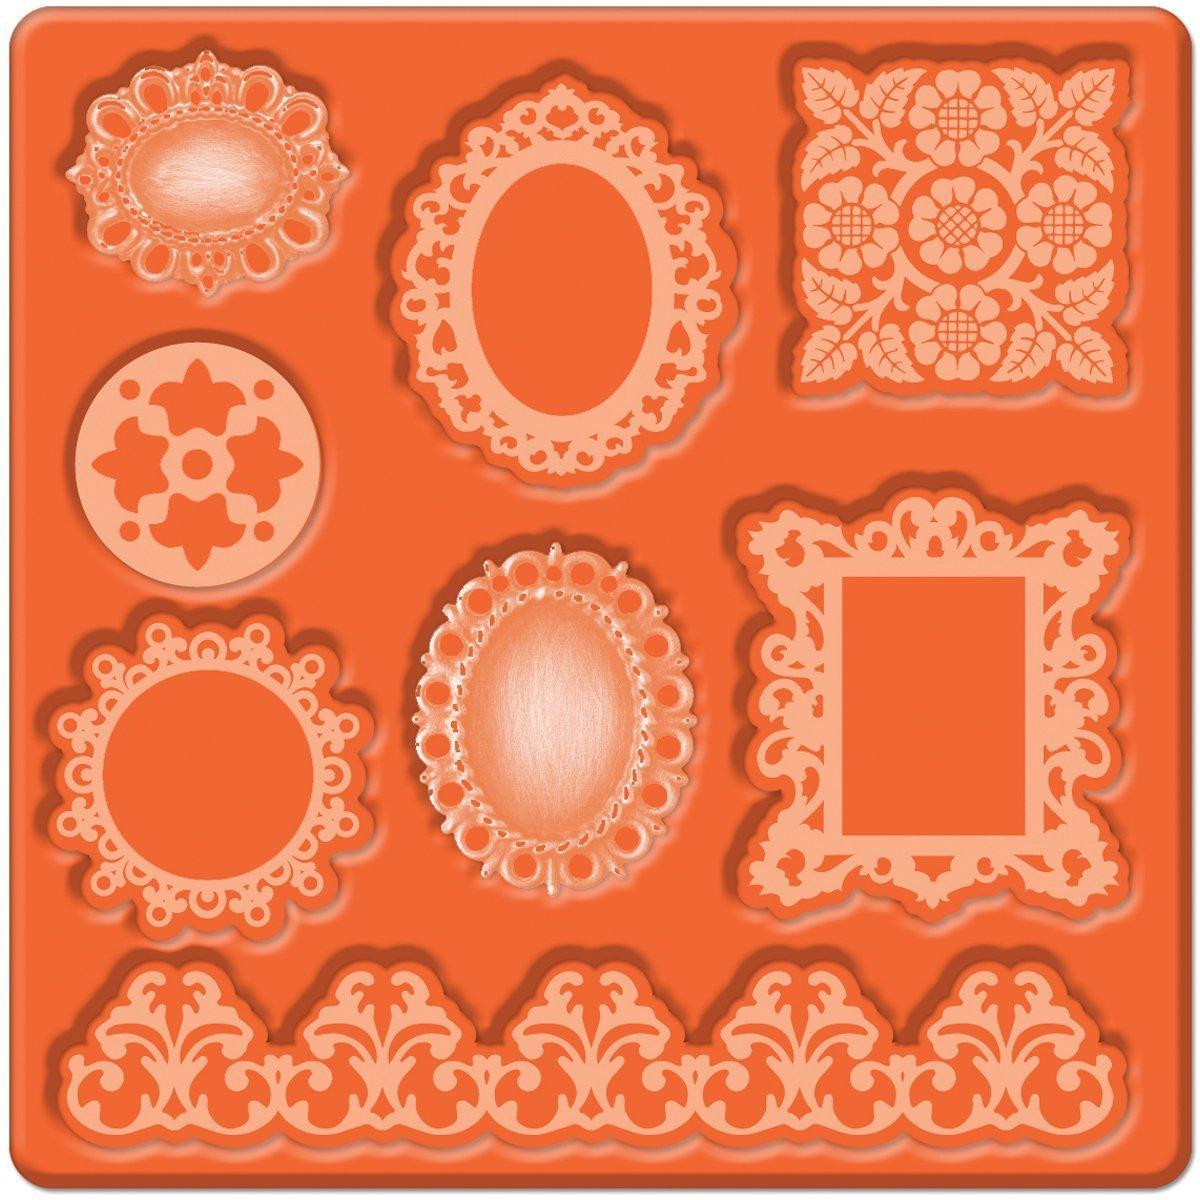 Generic Mod Podge 24892 Mod Mold Ornaments